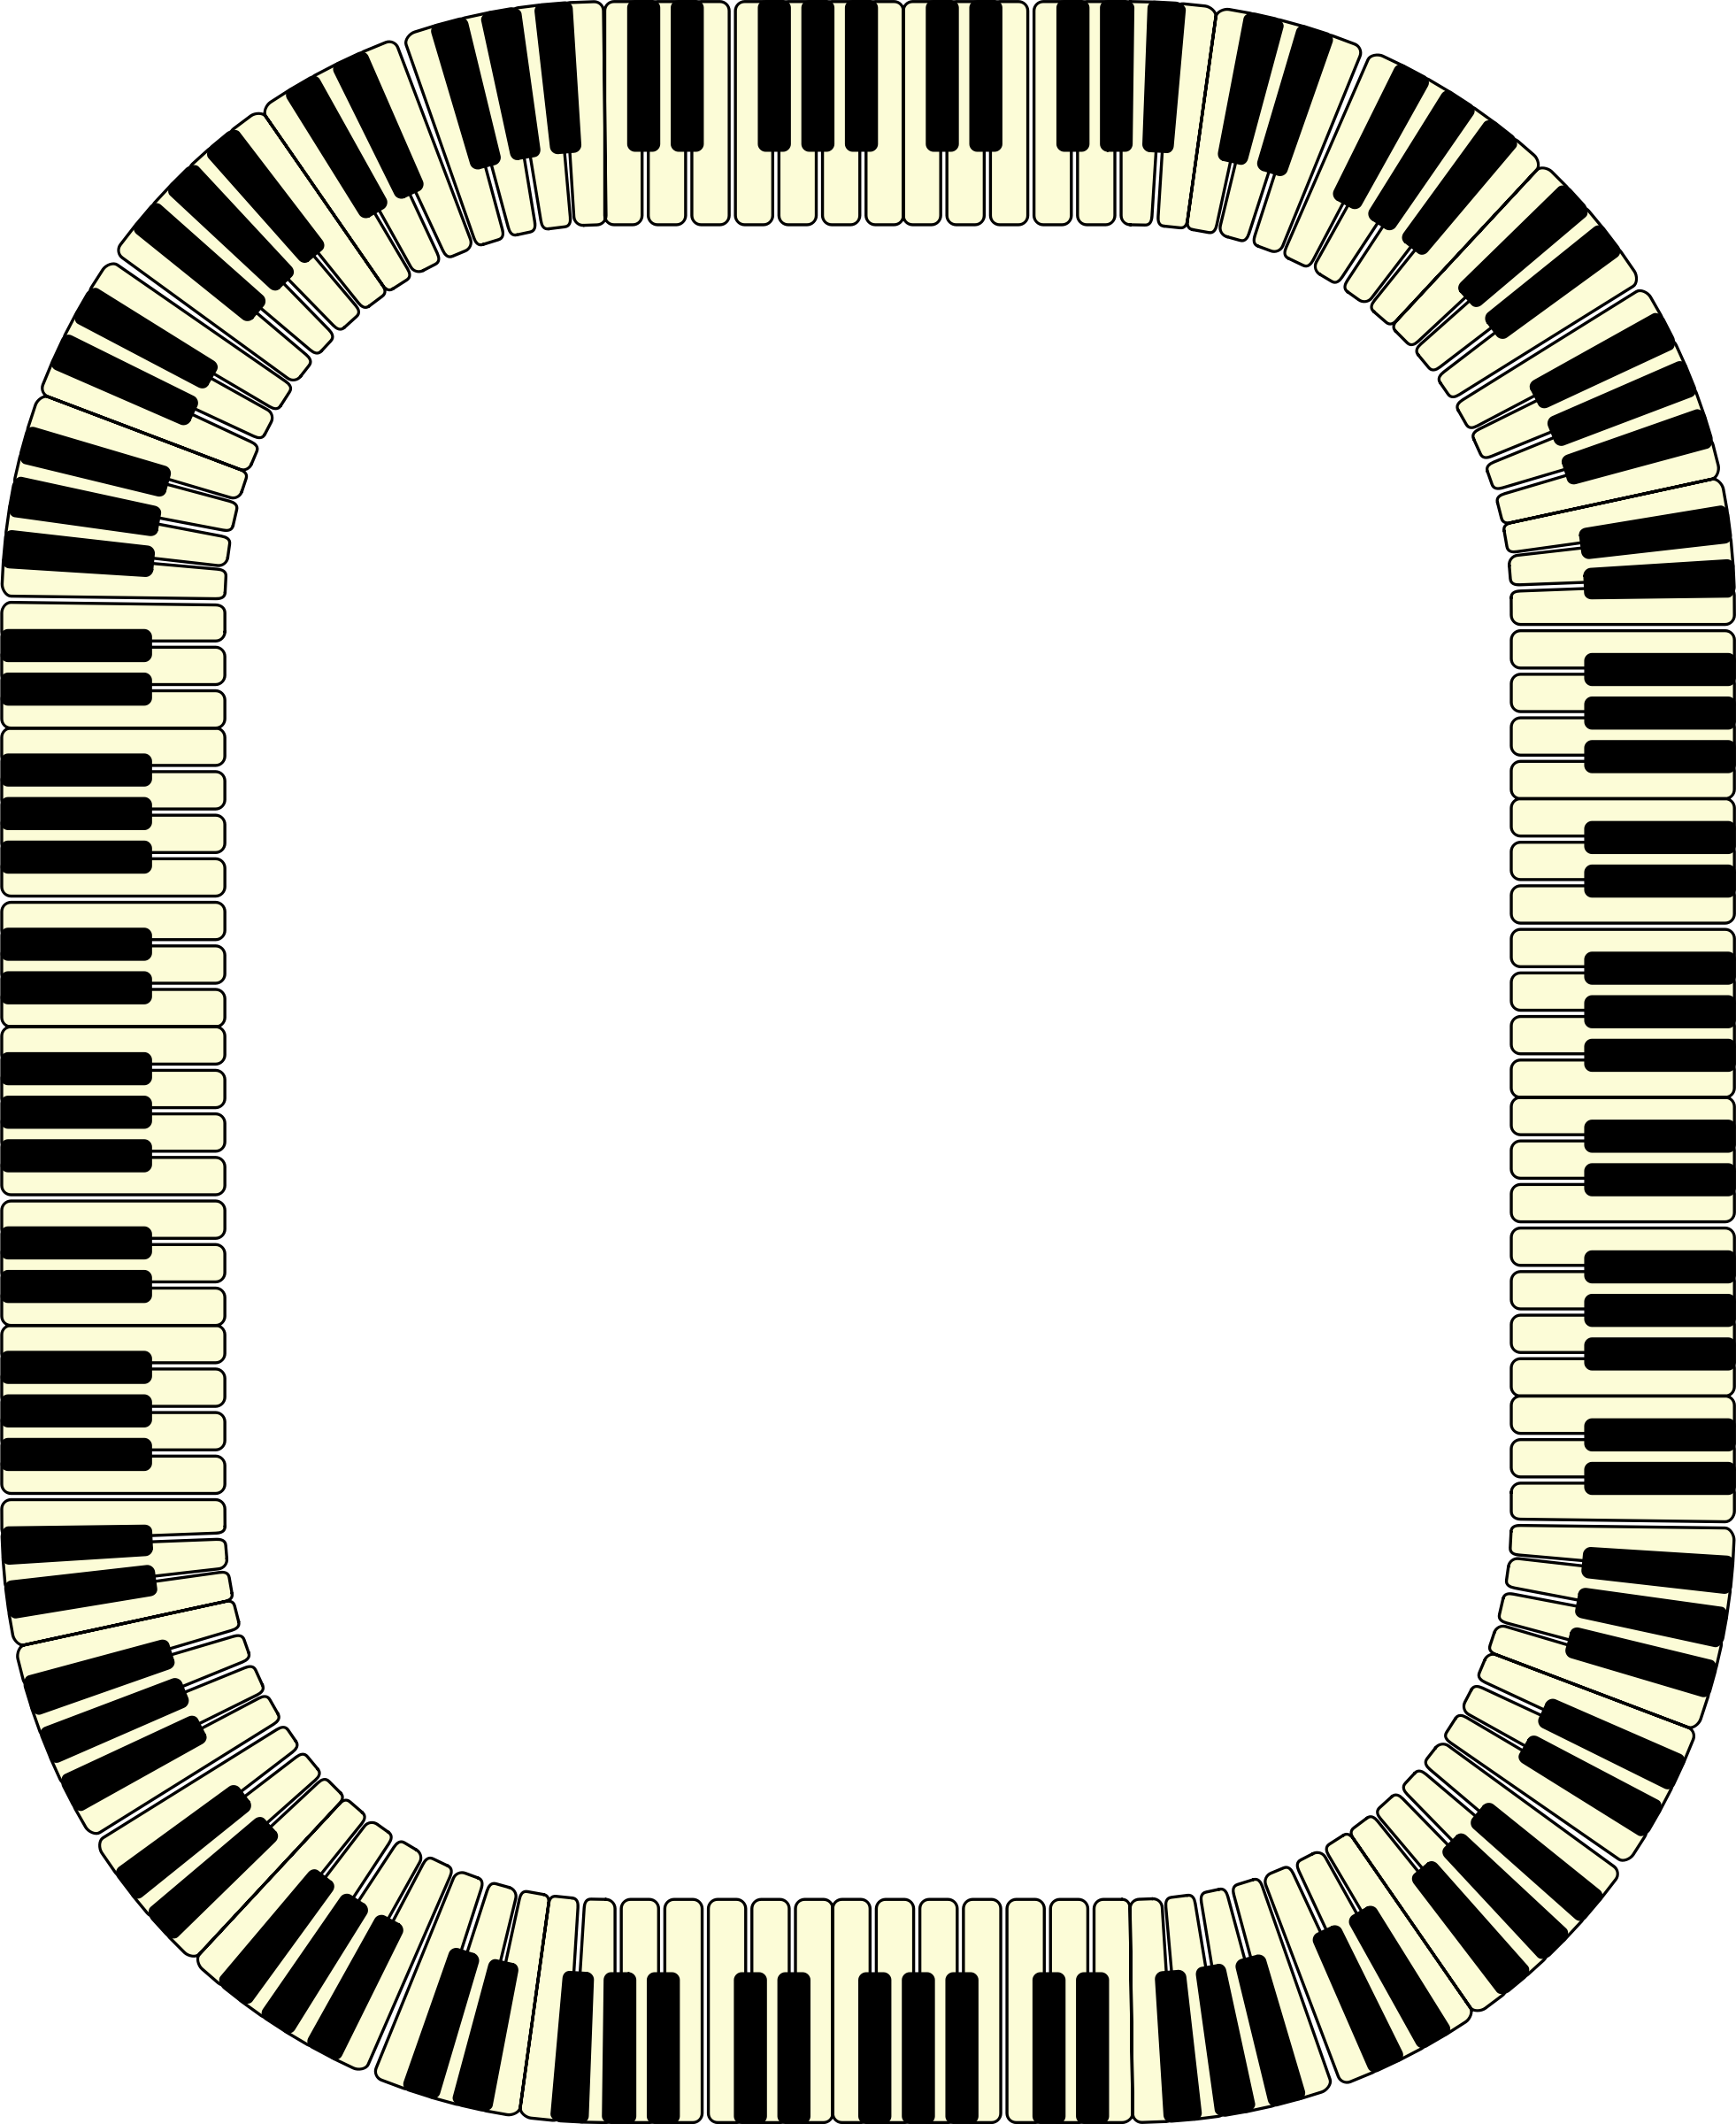 Clipart piano frame. Keys rectangle big image